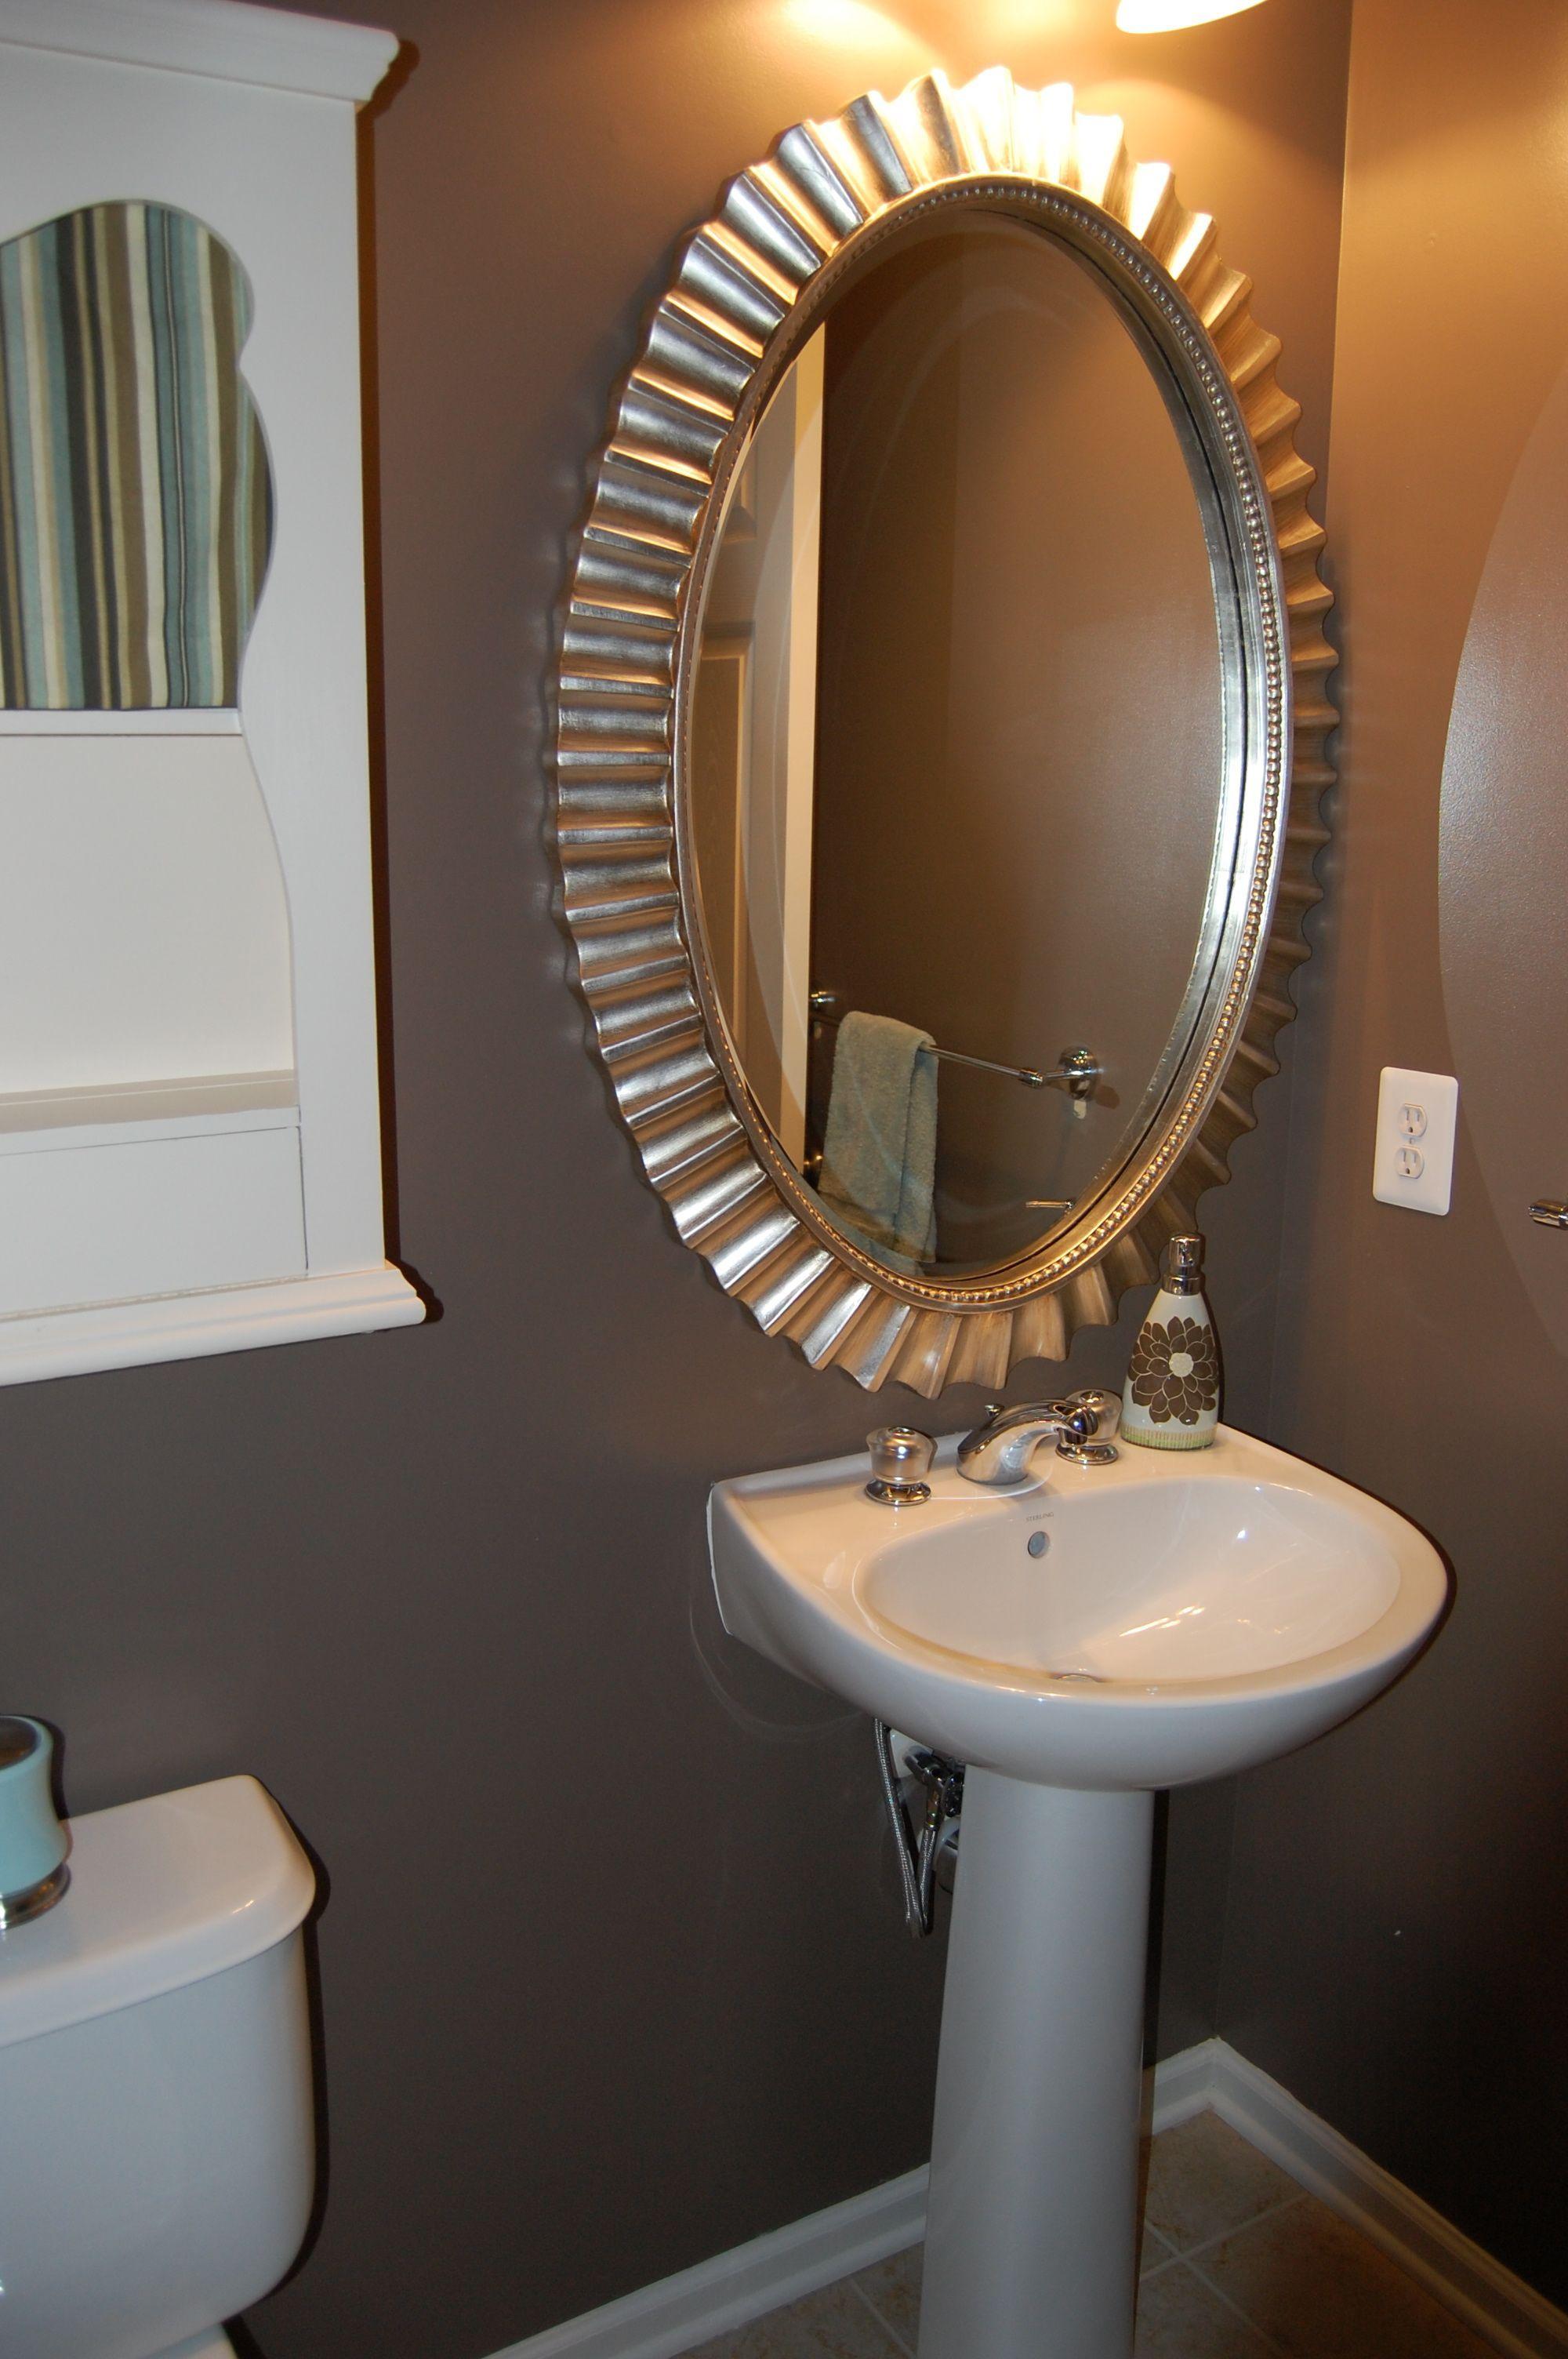 20 Gorgeous Small Powder Room Ideas Pinterest on Small Space Small Bathroom Ideas Pinterest id=28548